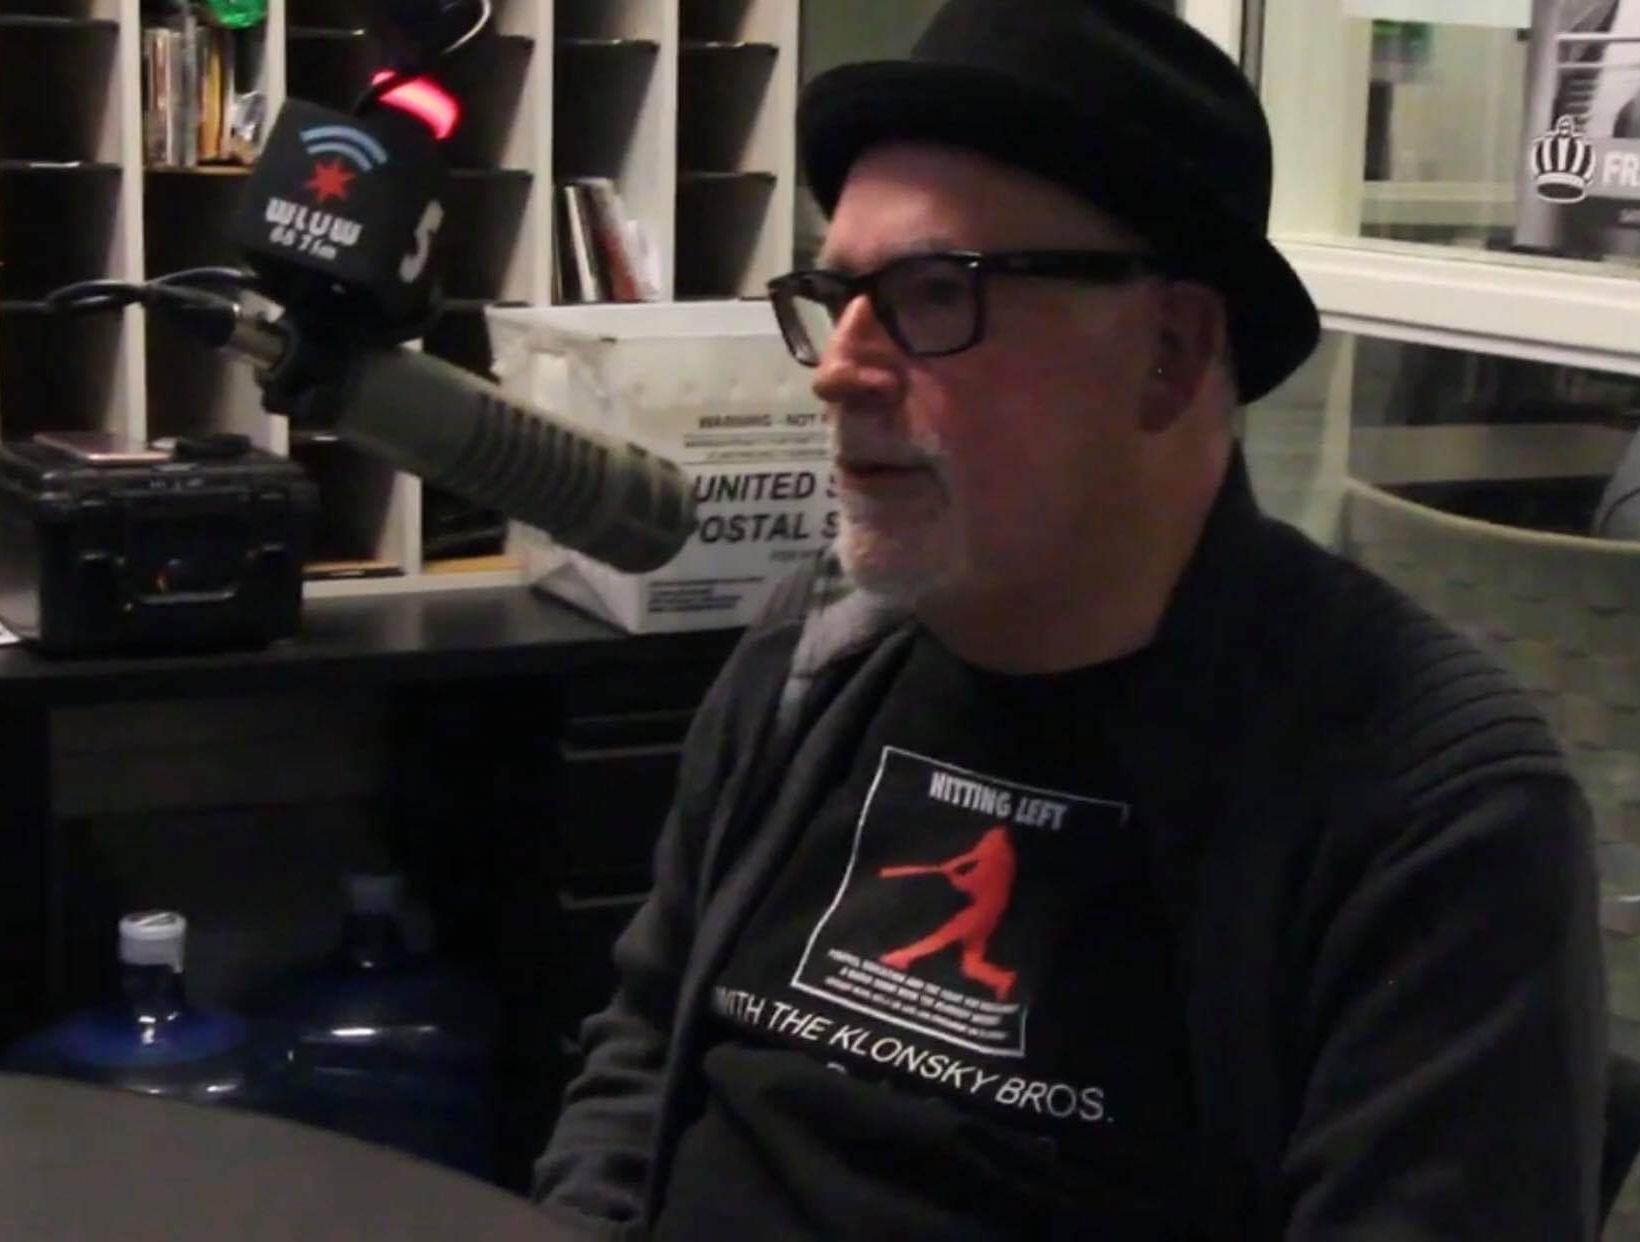 Fred Klonsky - Radio host, retired art teacher and political analyst